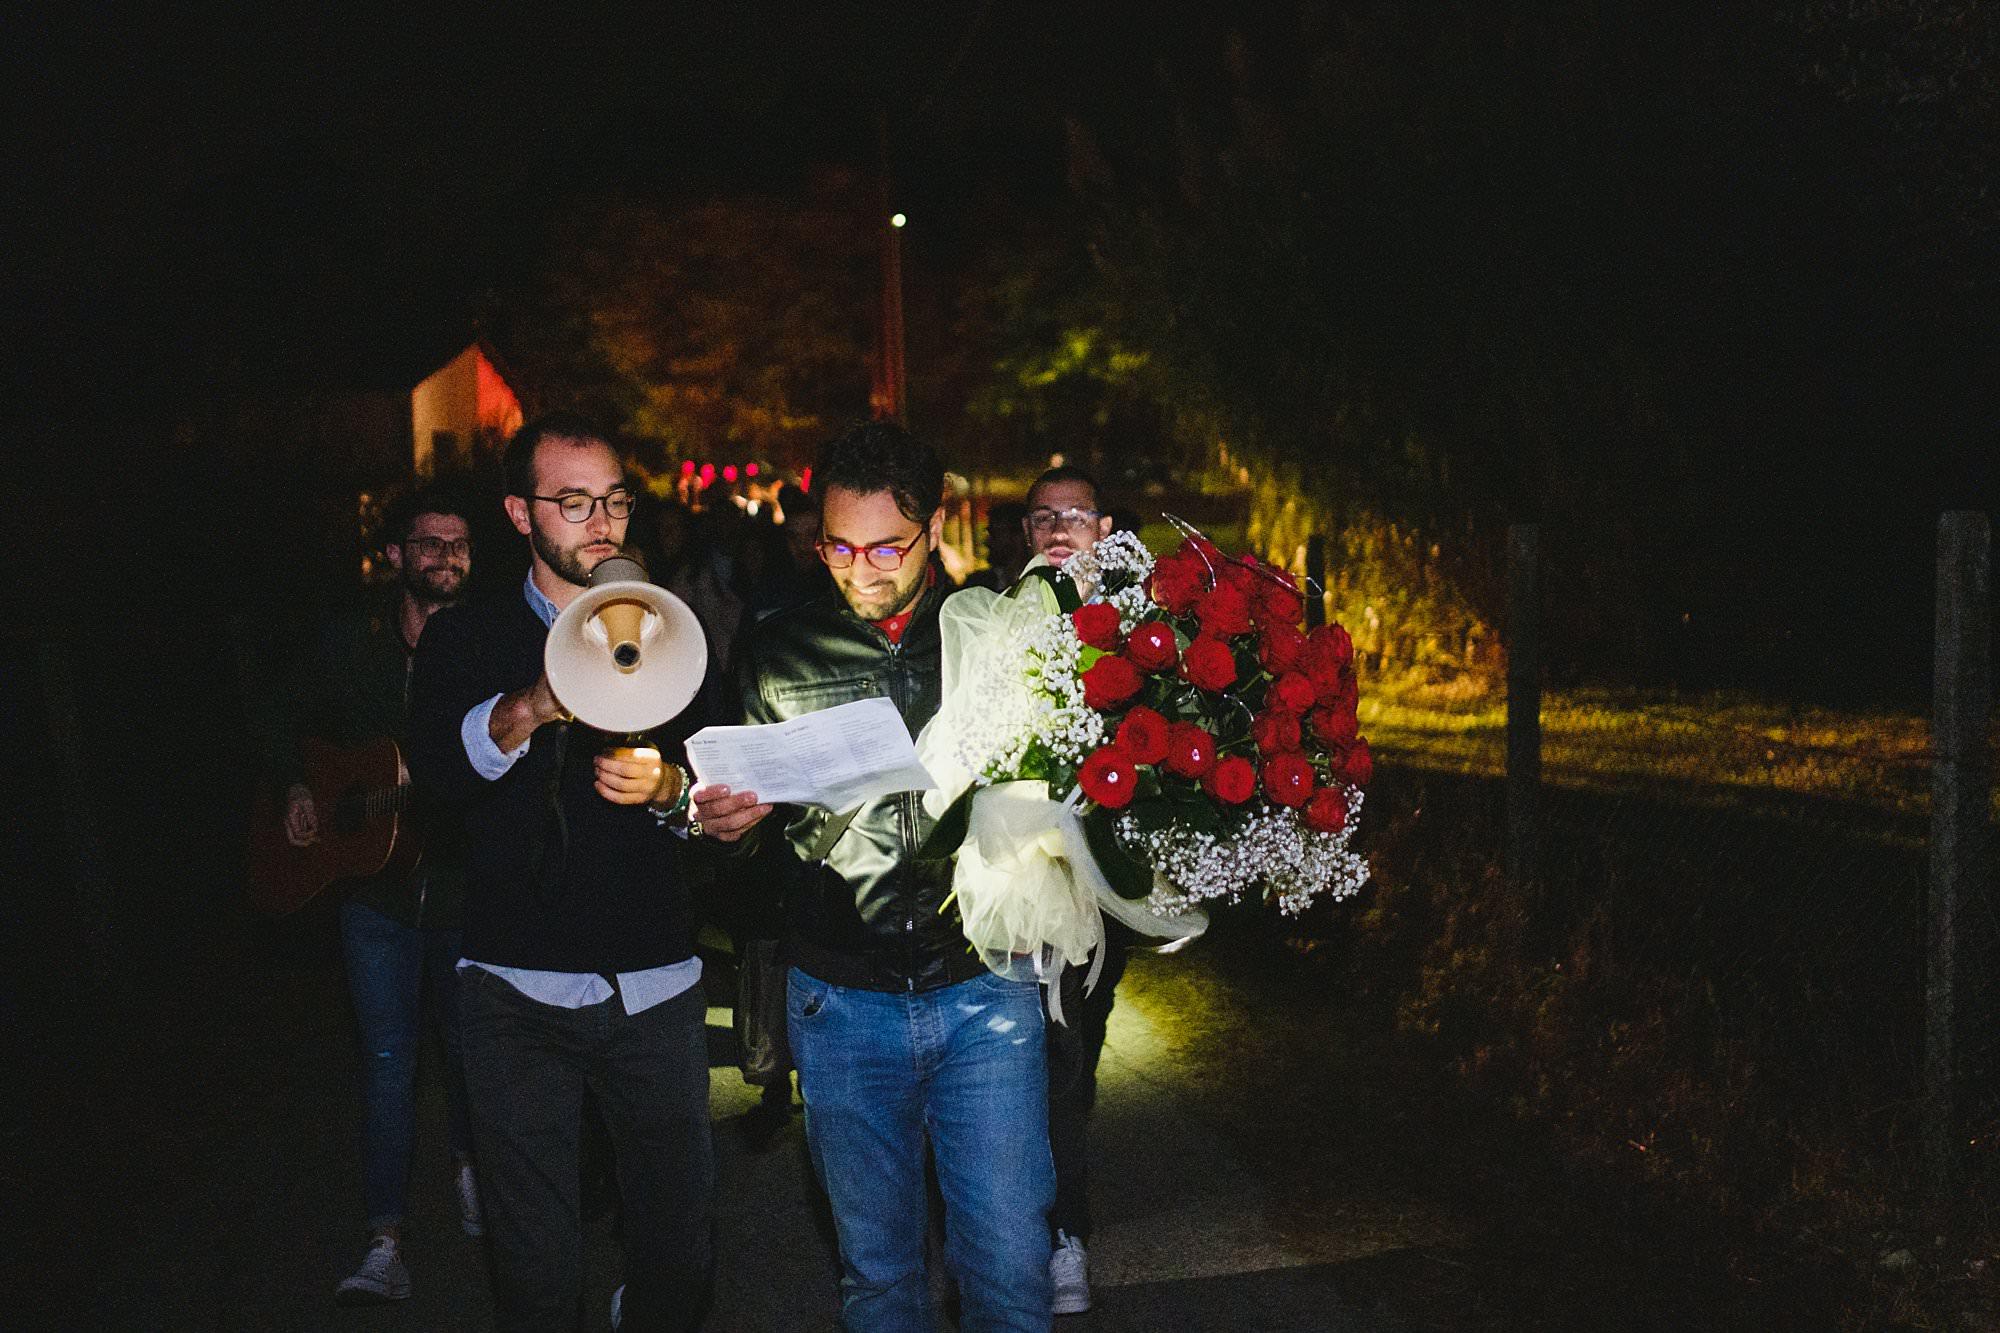 destination wedding photographer italy rg1 013 - Roberta + Giuseppe Part 1 | Italy Wedding Photography